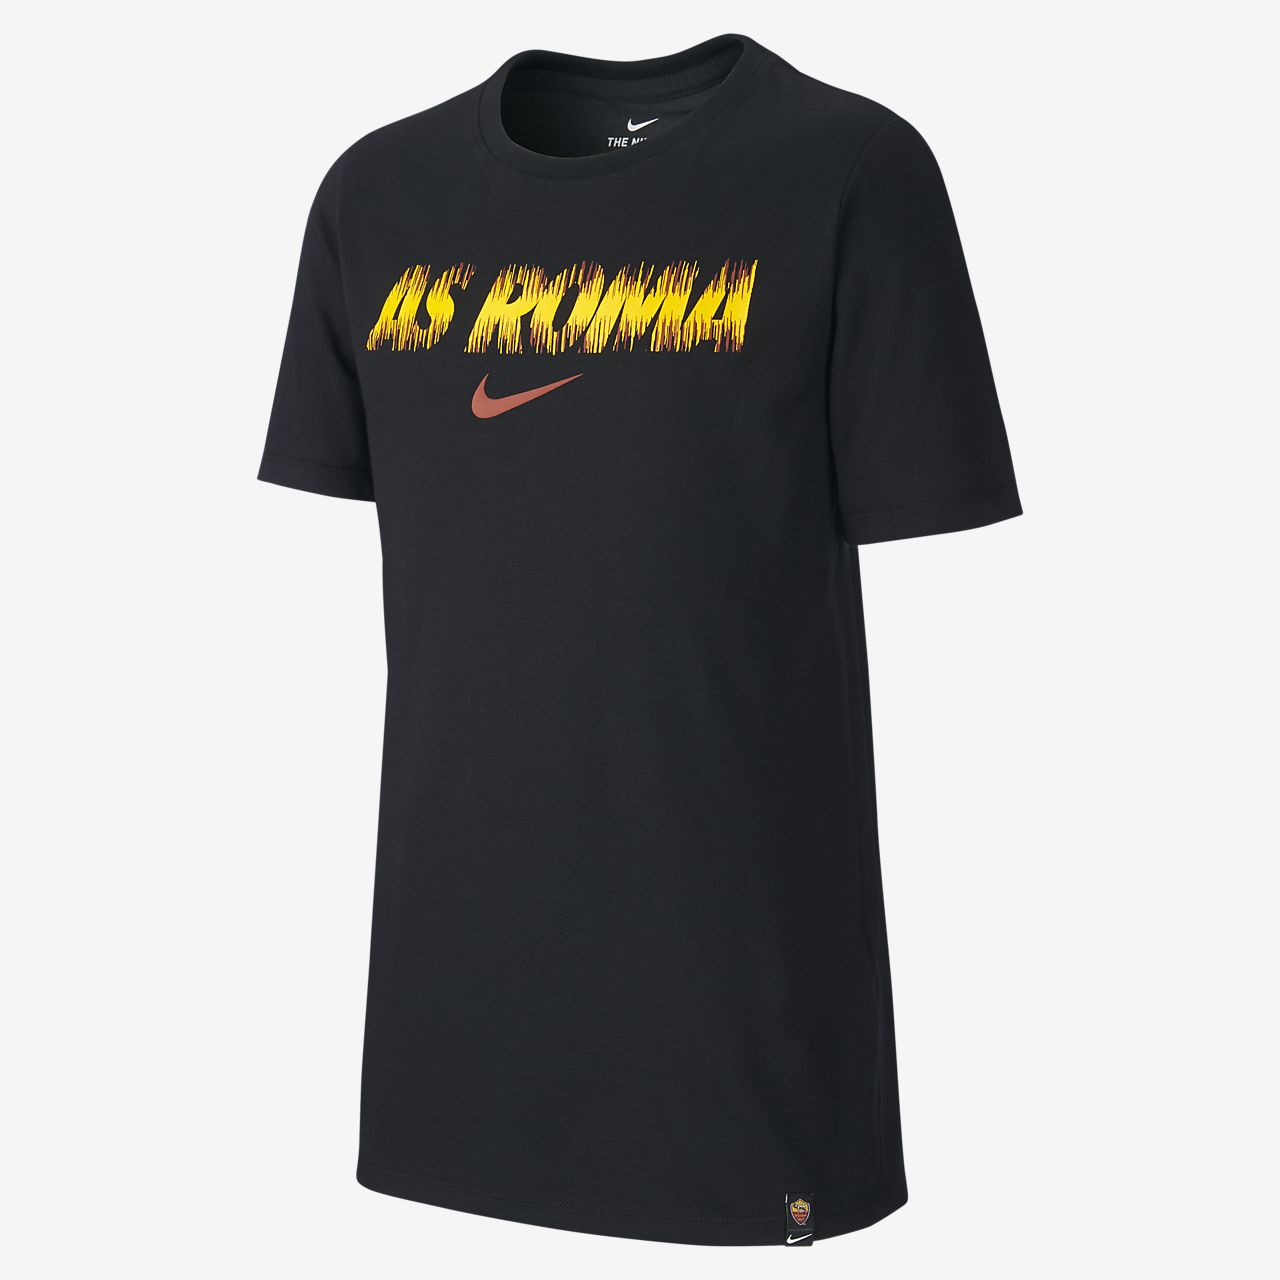 Nike Dri-FIT A.S. Roma Camiseta de fútbol - Niño/a